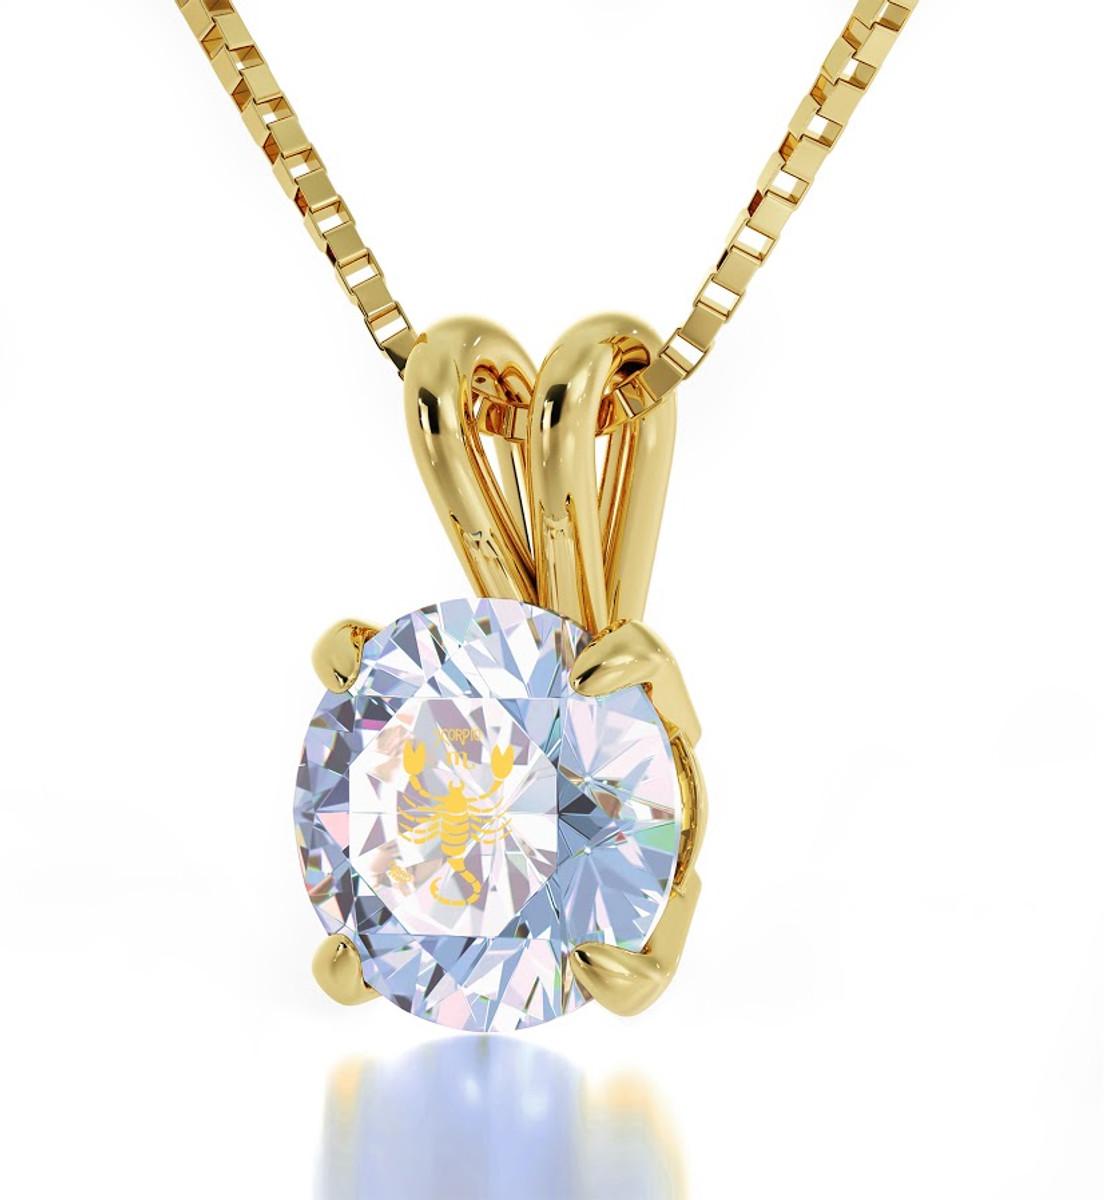 Inspirational Jewelry Necklace Gold Scorpio